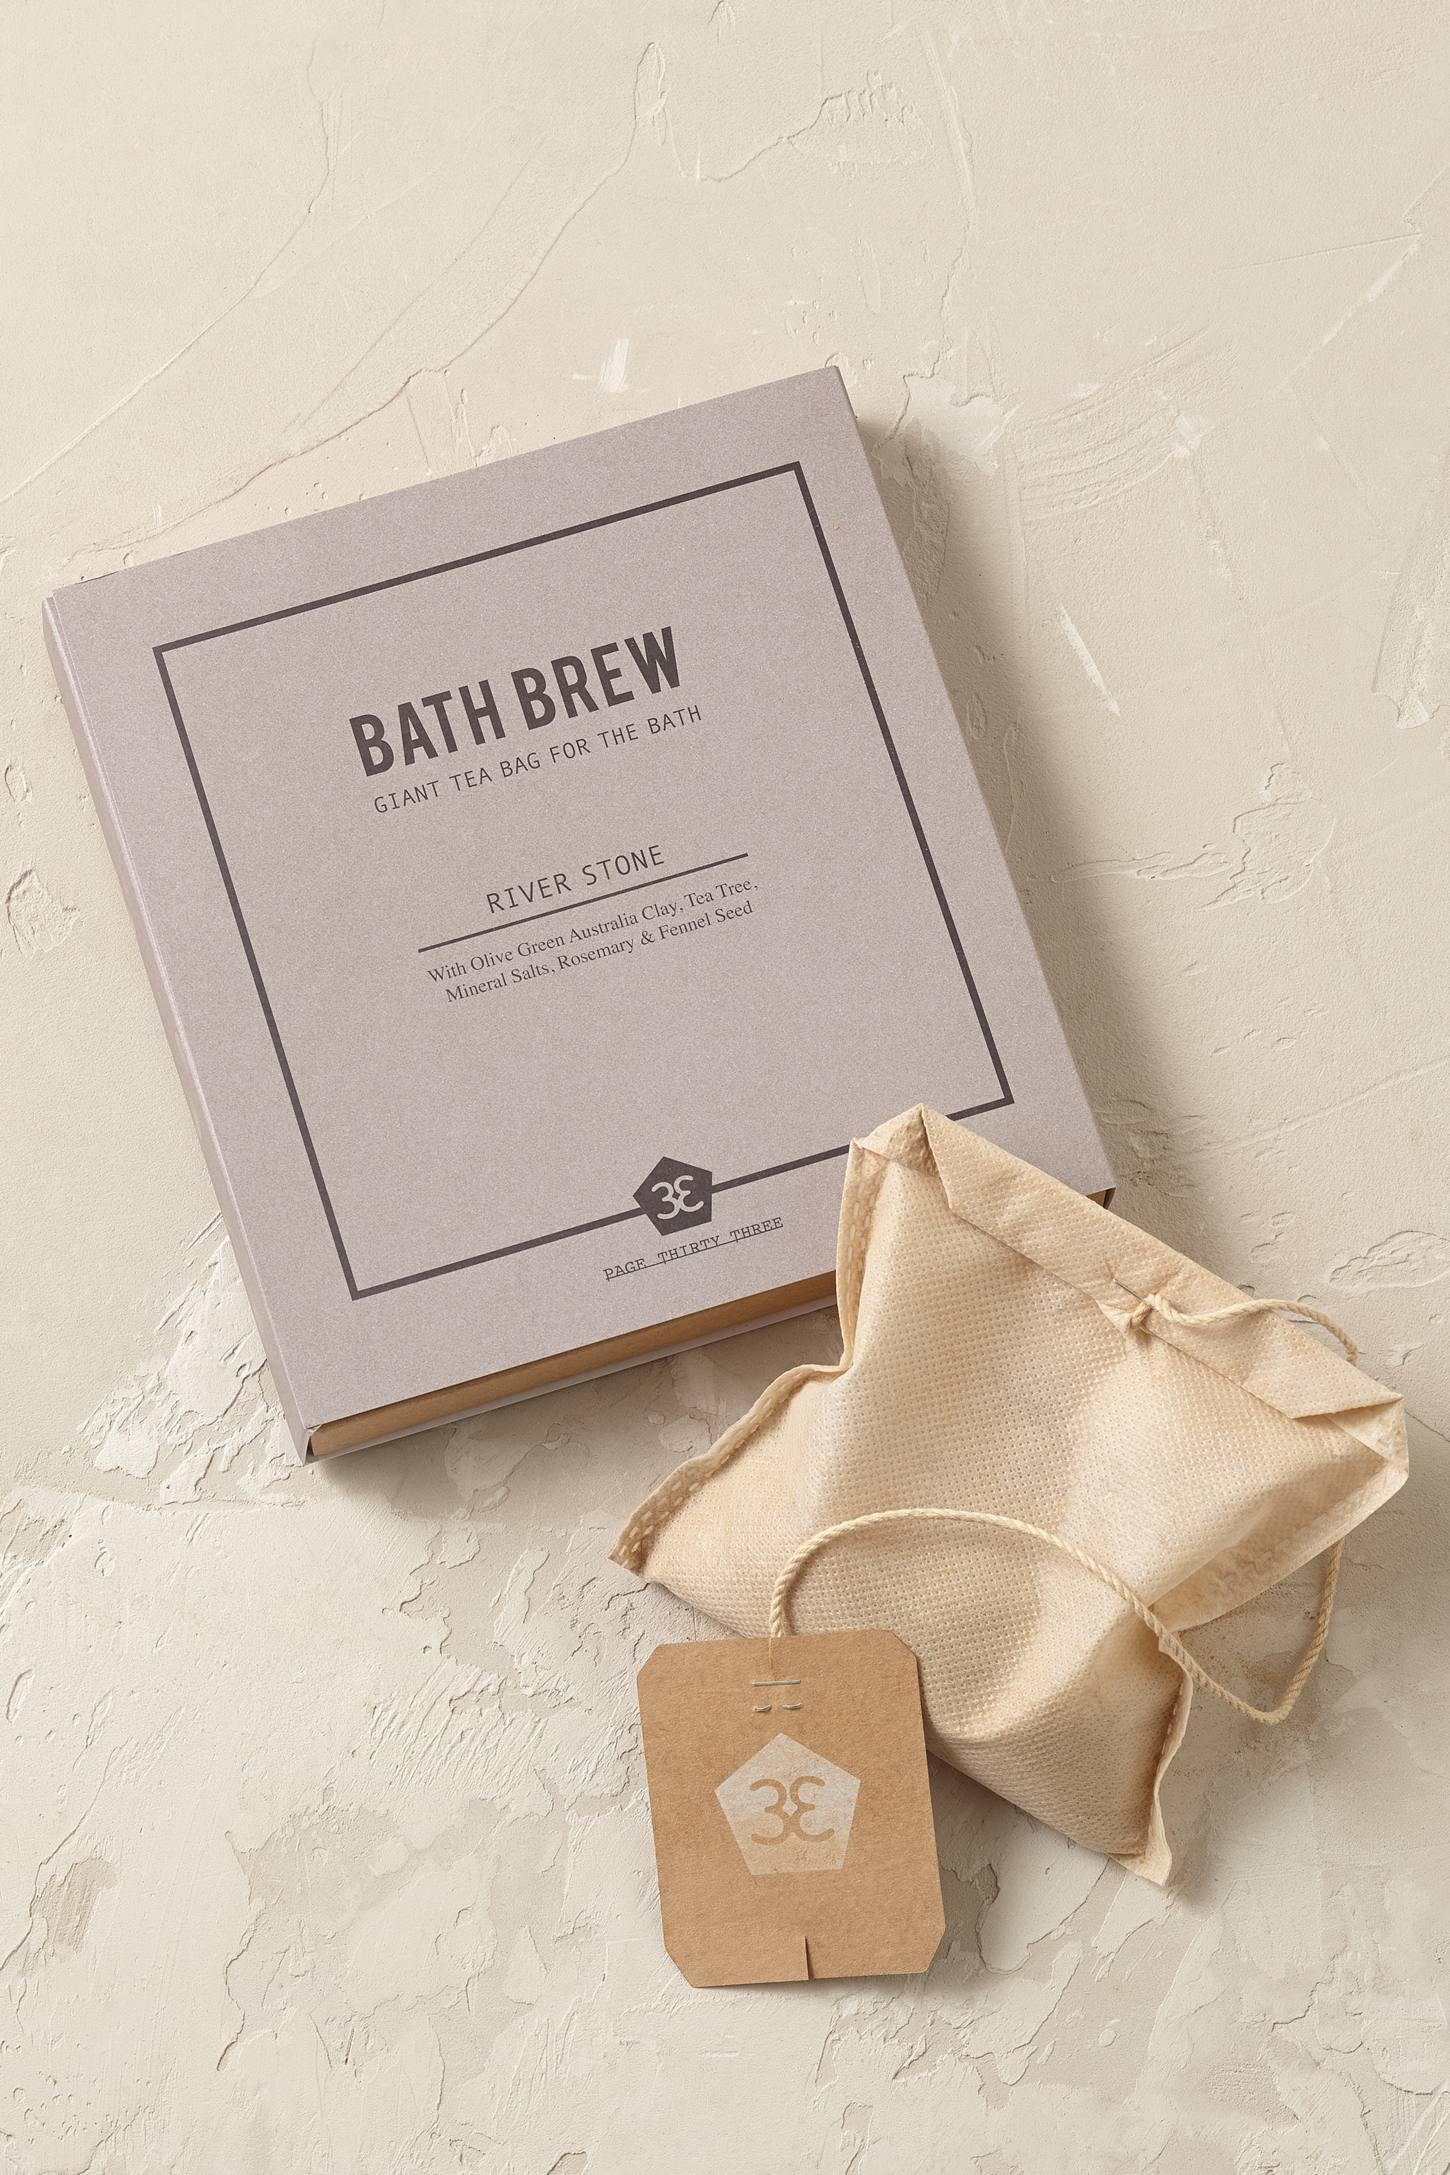 Lavender Bath Brew